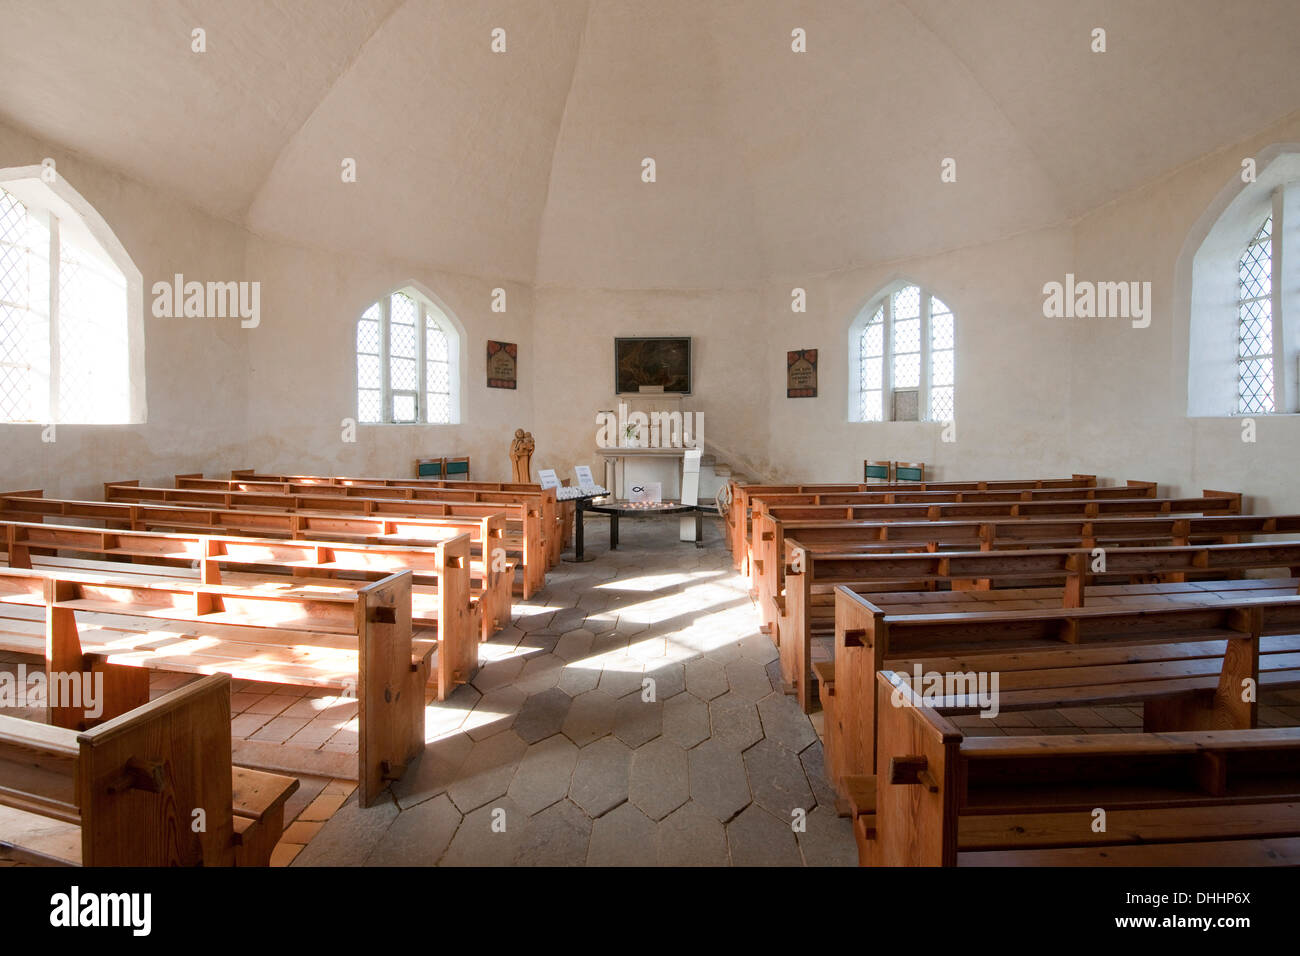 Interior, Vitt chapel, Vitt, Rügen, Mecklenburg-Western Pomerania, Germany - Stock Image